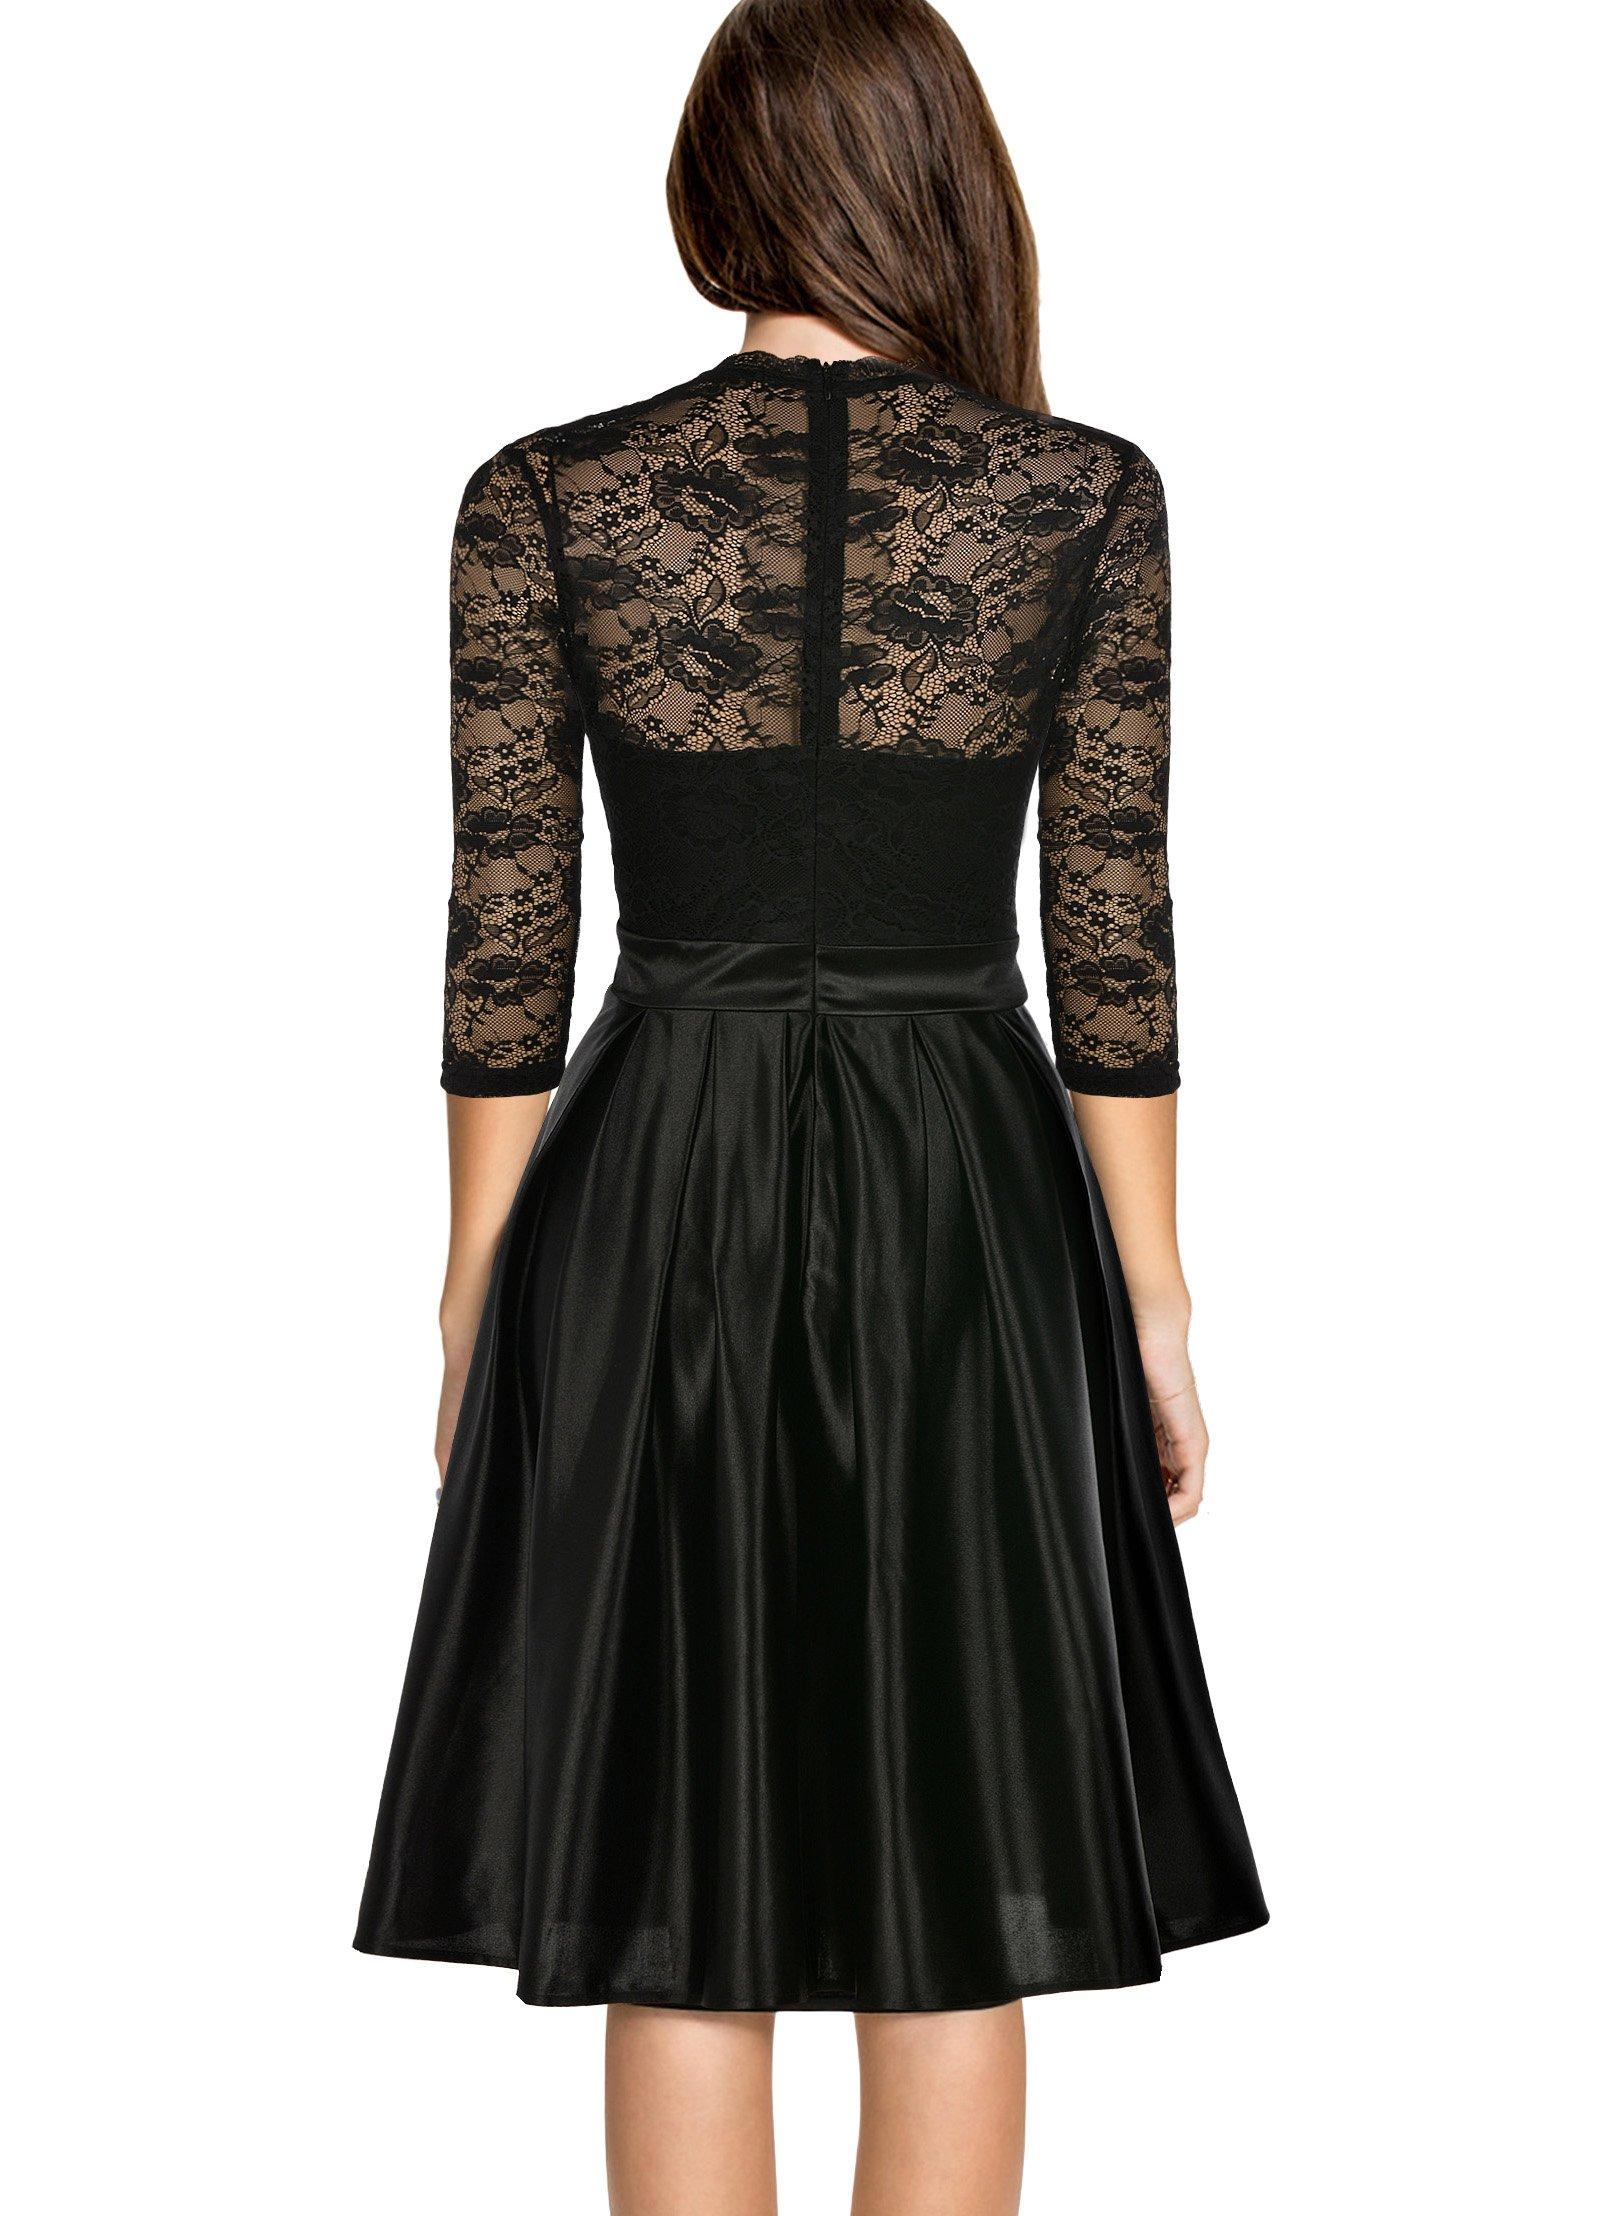 Mmondschein Women Vintage 1930s Style 3/4 Sleeve Black Lace A-line Party Dress Black L by Mmondschein (Image #2)